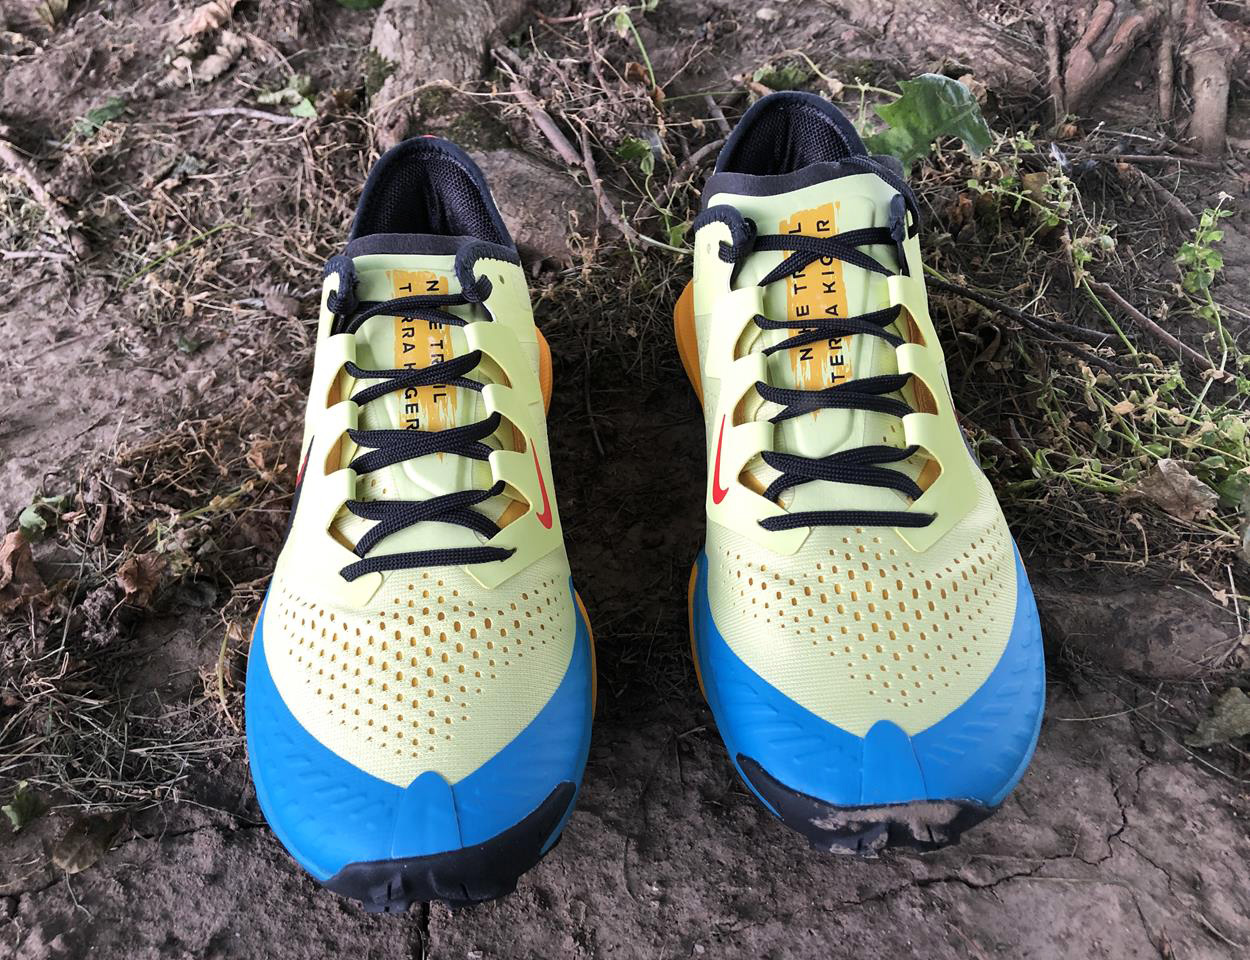 Nike Zoom Terra Kiger 7 - Toe